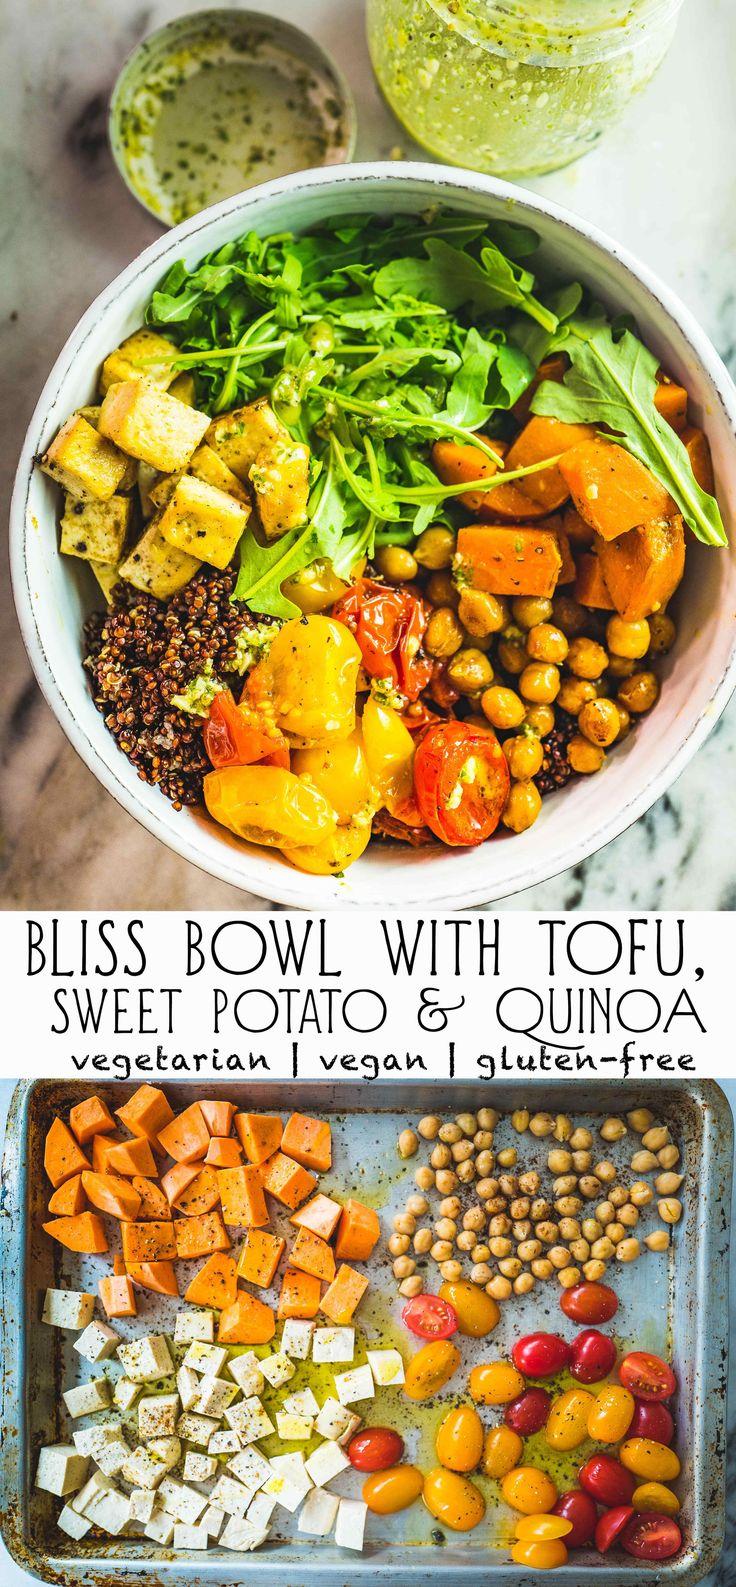 Bliss Bowl with Tofu, Sweet Potato, Quinoa & Cherry Tomatoes   Tiong Bahru Kitchen